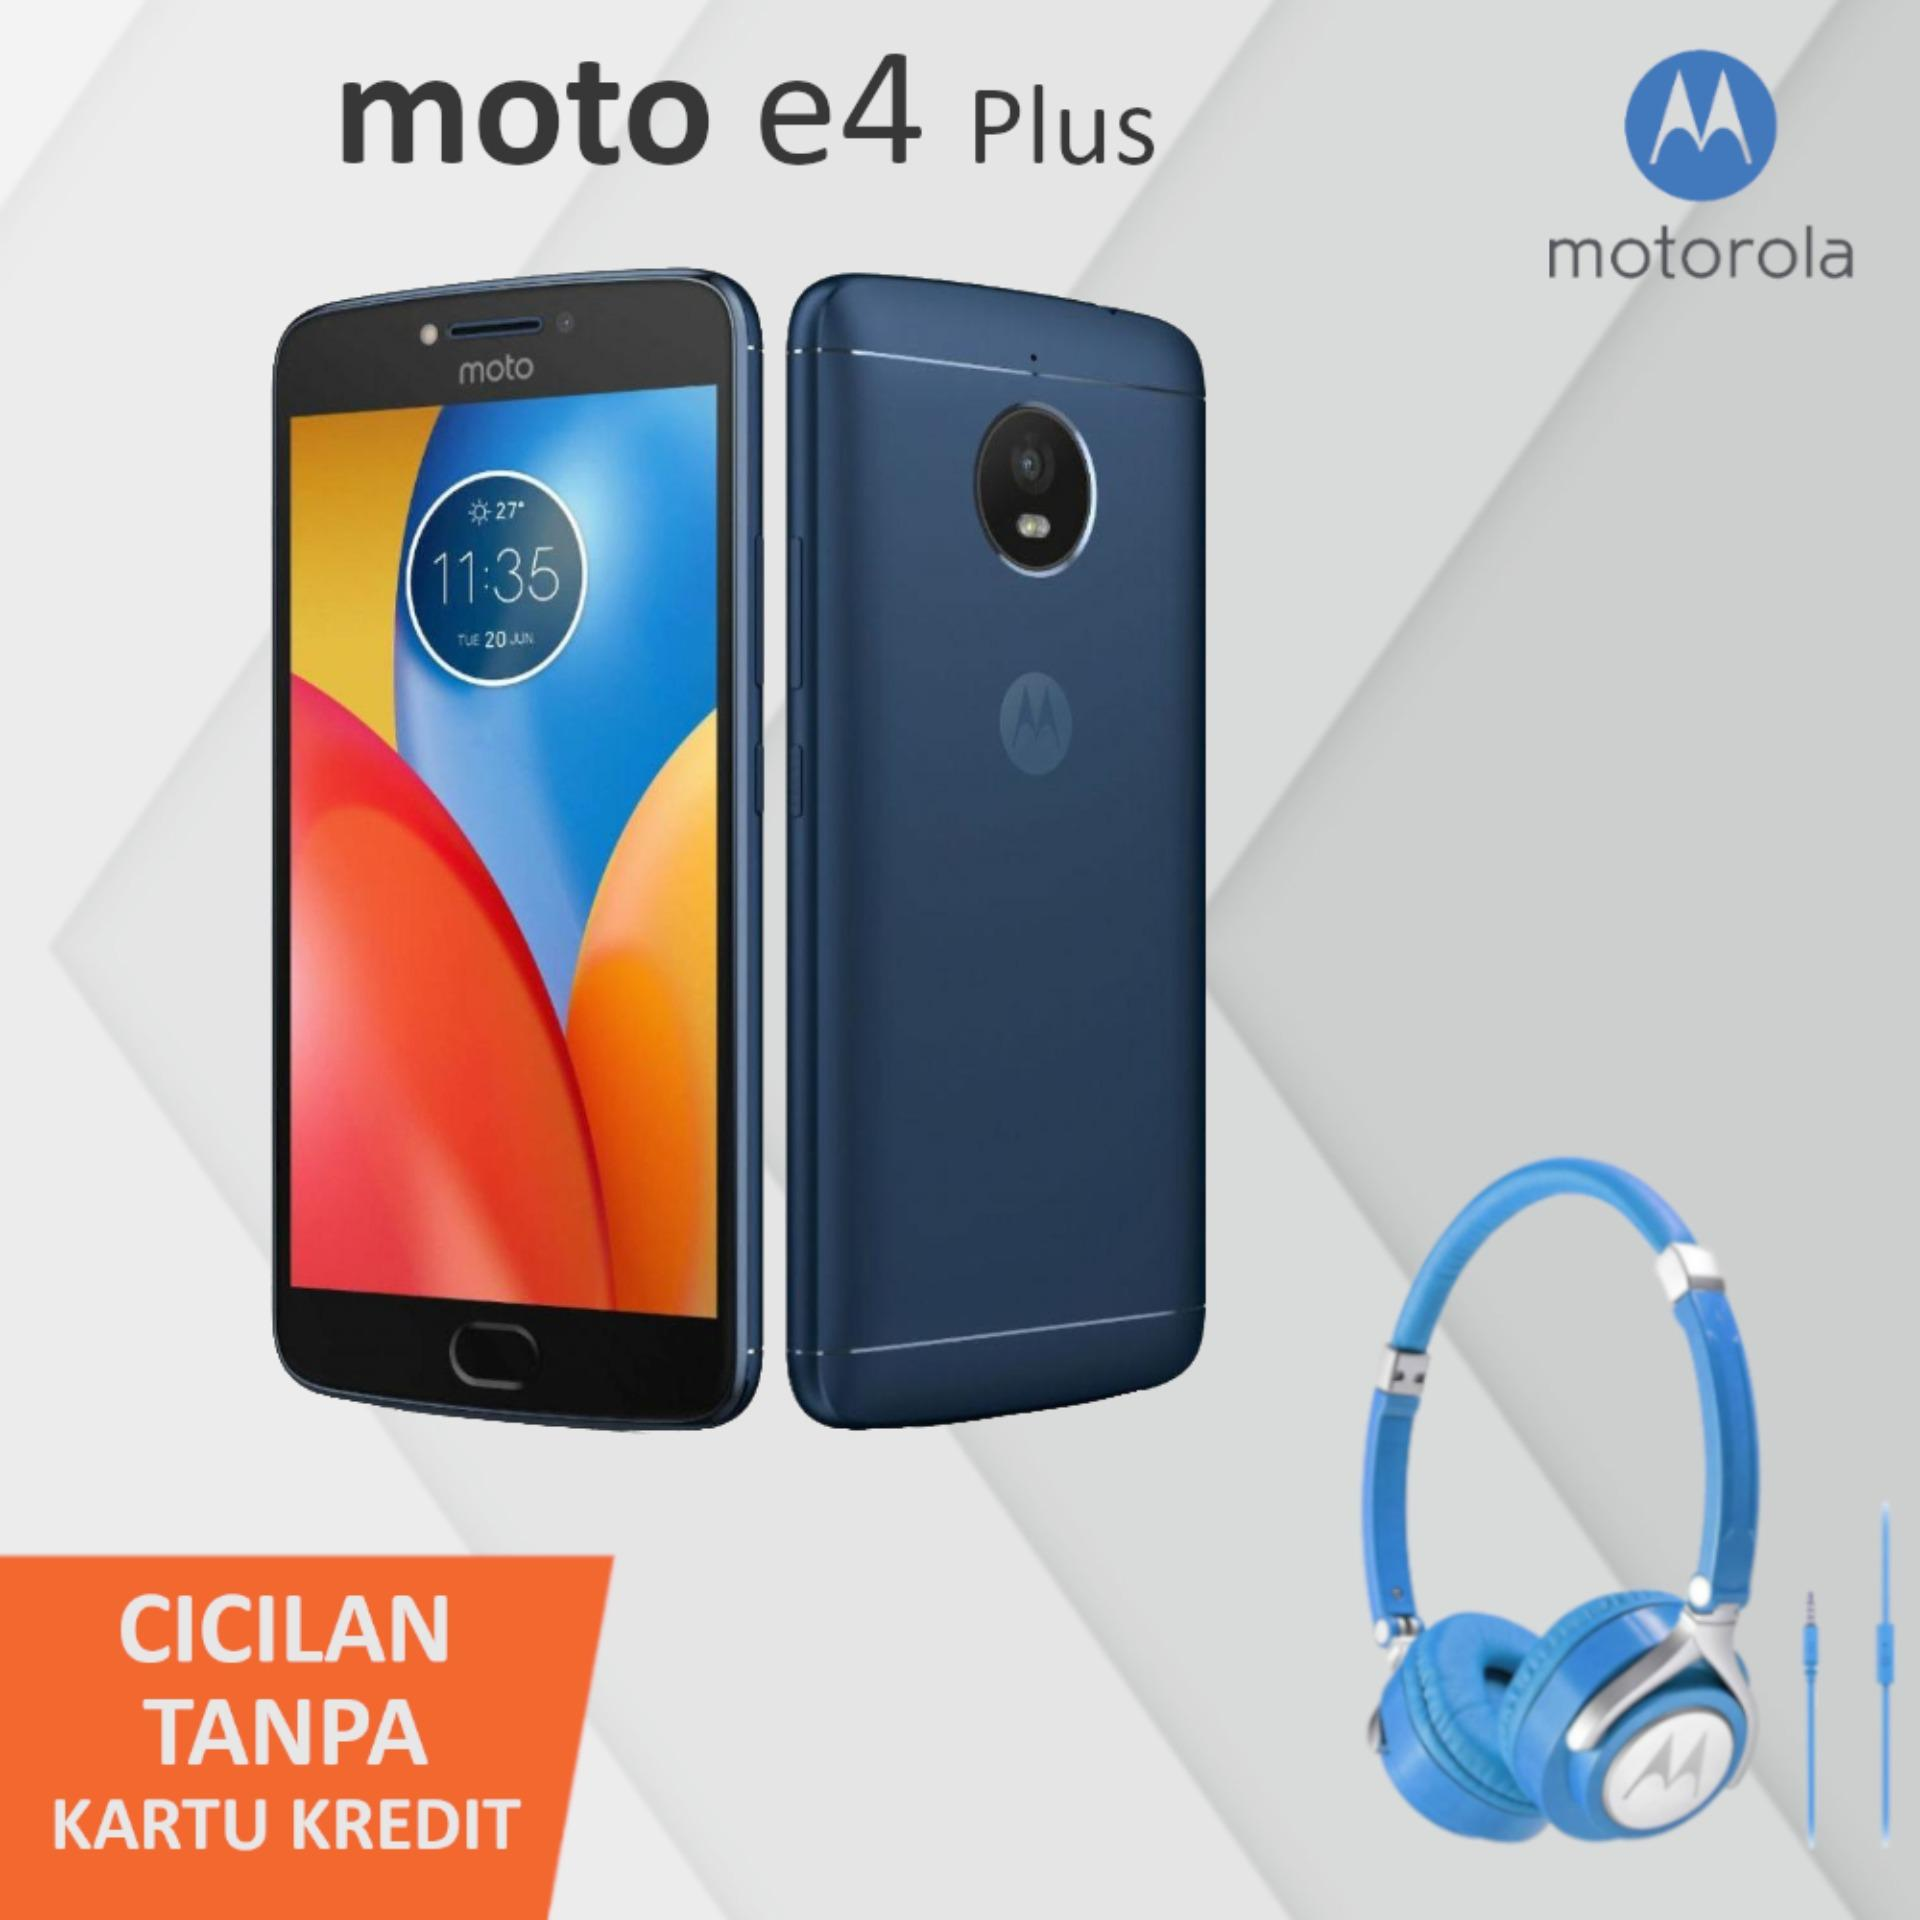 Motorola Moto E4 Plus 4G LTE Snapdragon™ 427 32GB 13MP + 5MP 5000mAh Fingerprint + Free Pulse 2 Headphone